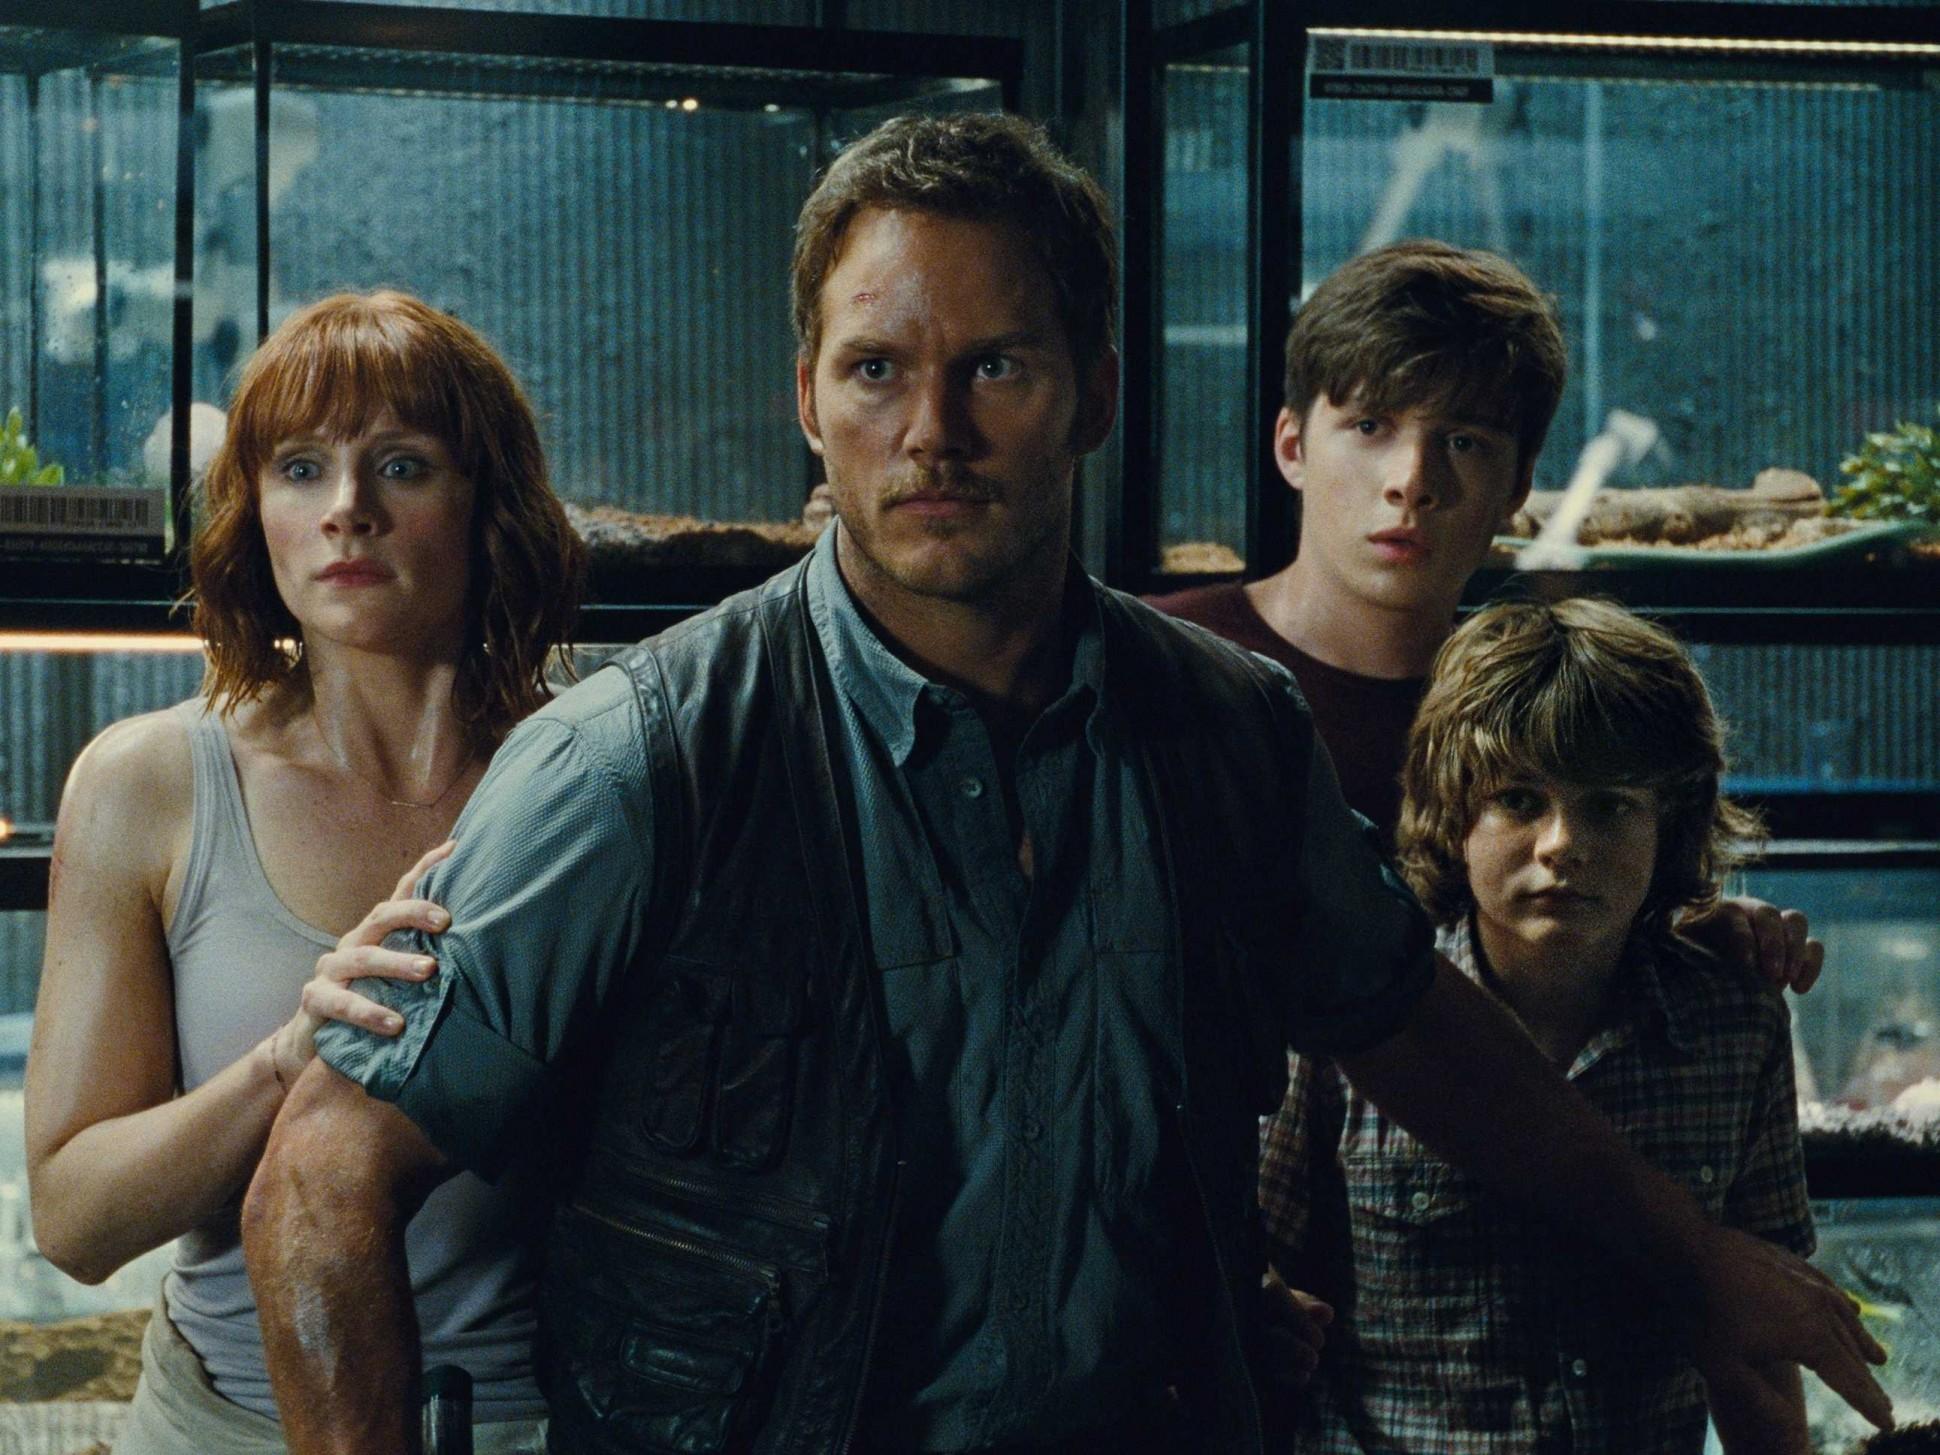 Jurassic World - Chris Pratt